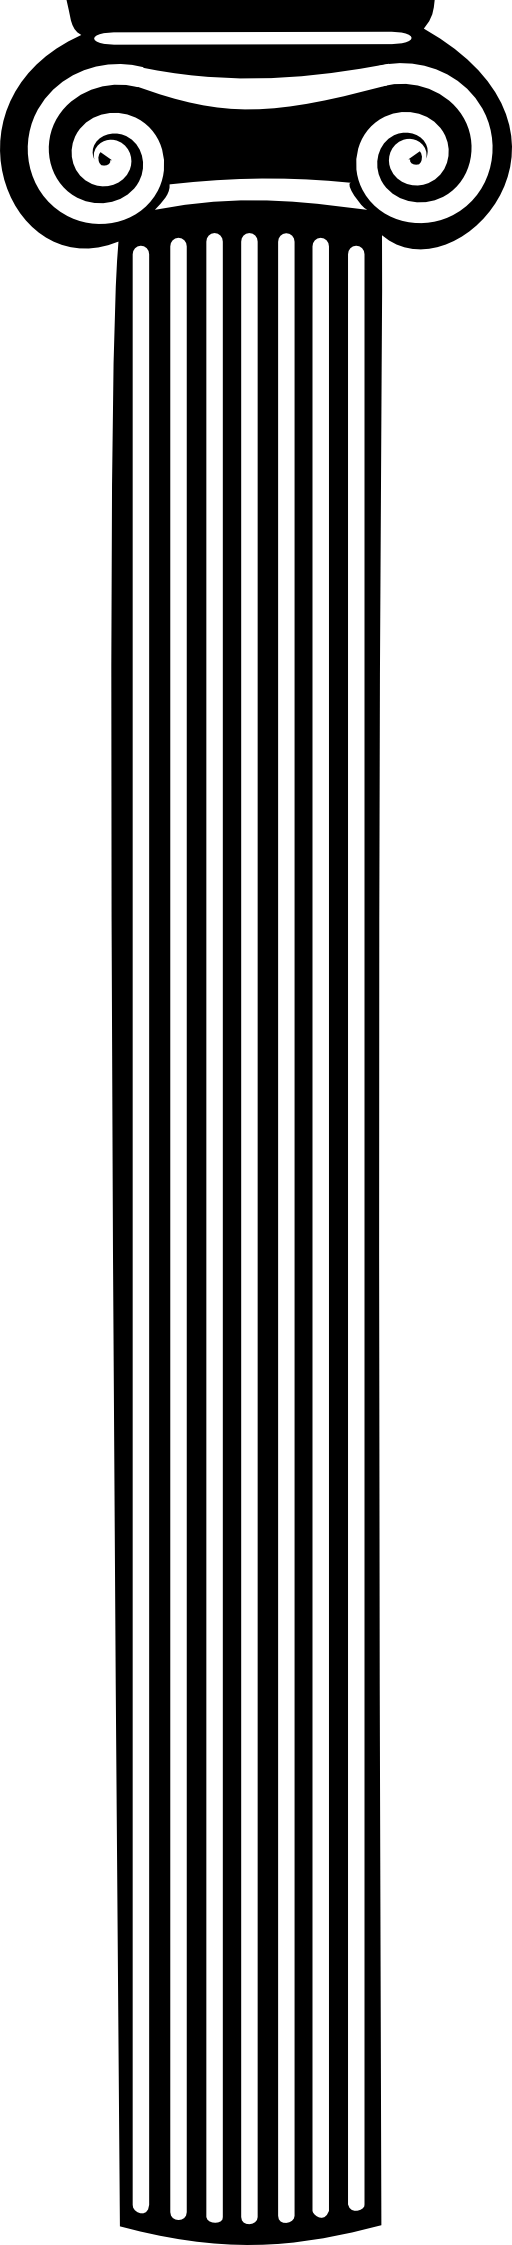 jpg library download Greek Columns Clipart